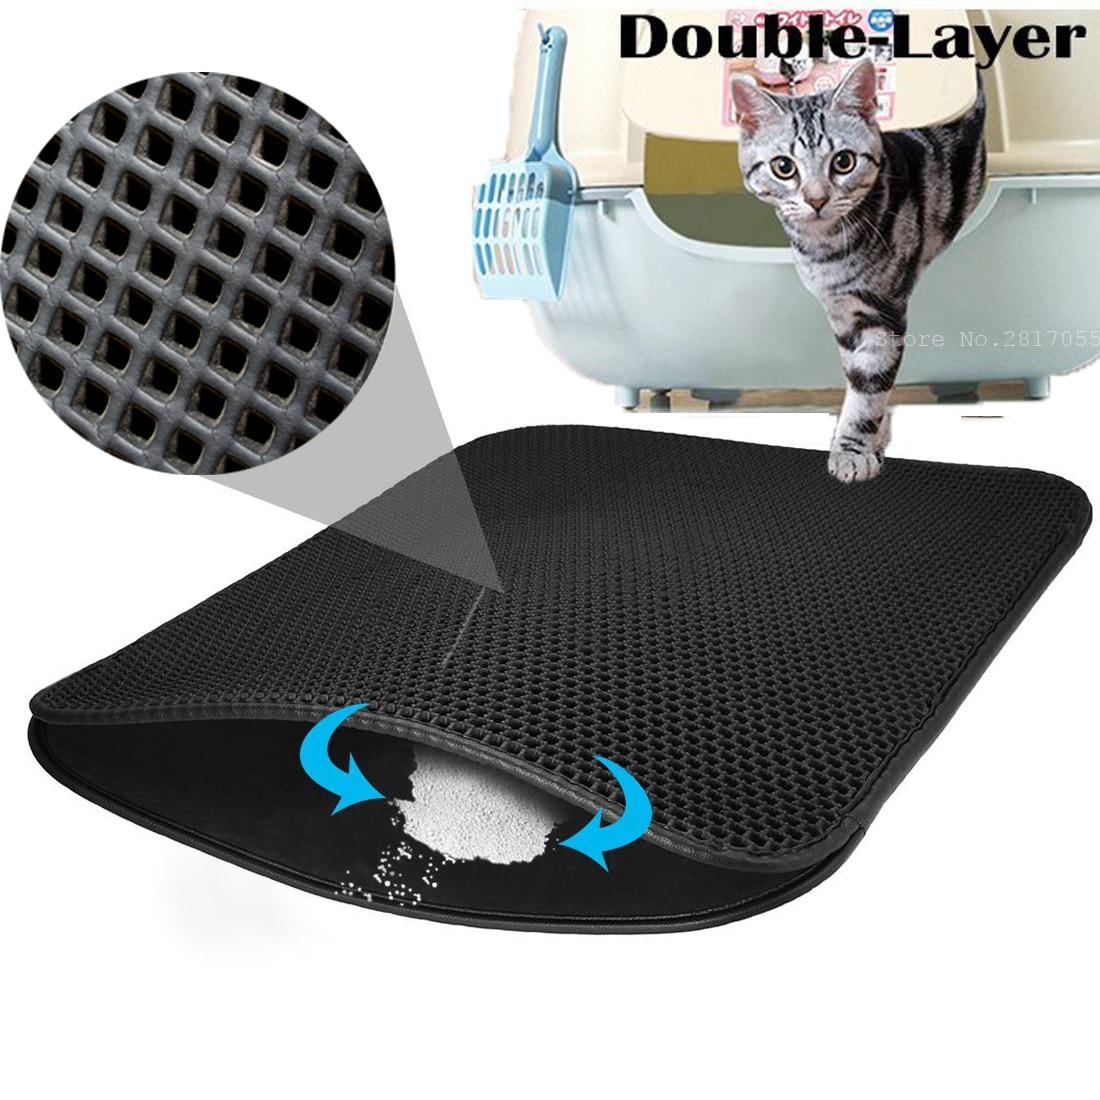 Small Medium Large Waterproof Cat Litter Mat Pad Black Cats Litter Trapper Double Layer Nonslip EVA Protect Floor Feeding Mats